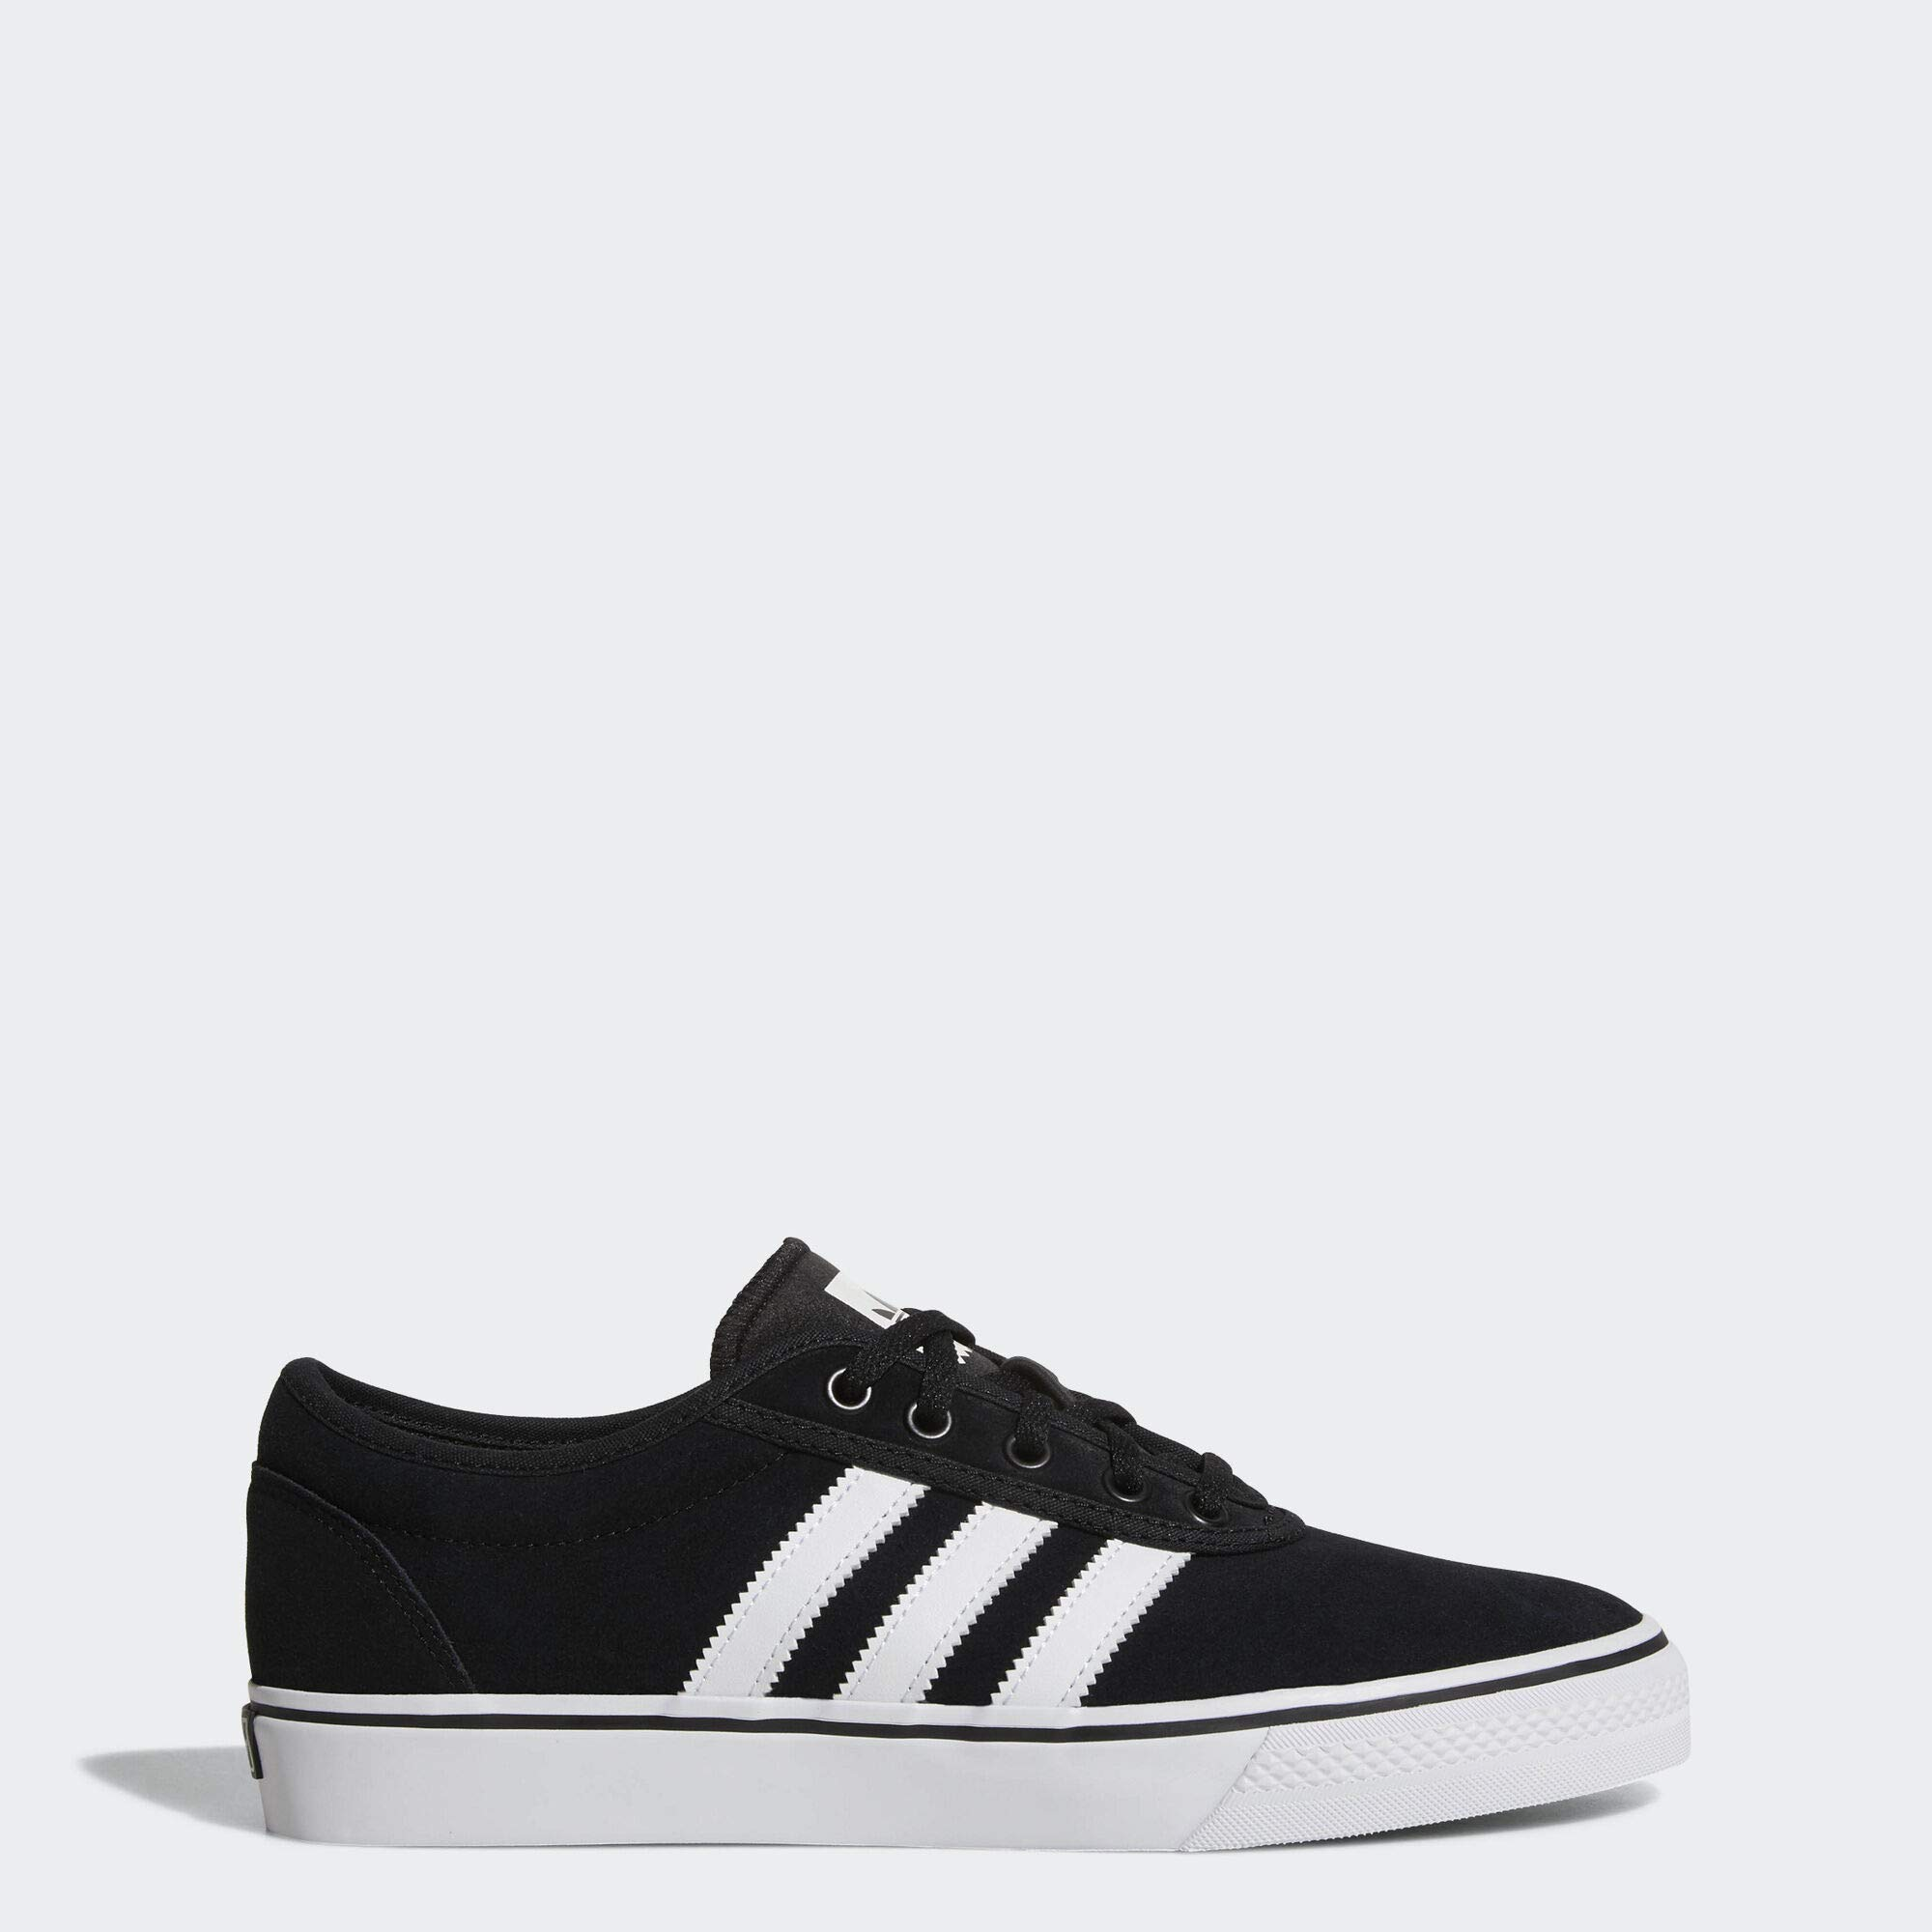 adidas Originals Men's Adi-Ease Premiere Tennis Shoe, Core Black/White/Core Black, 10 M US